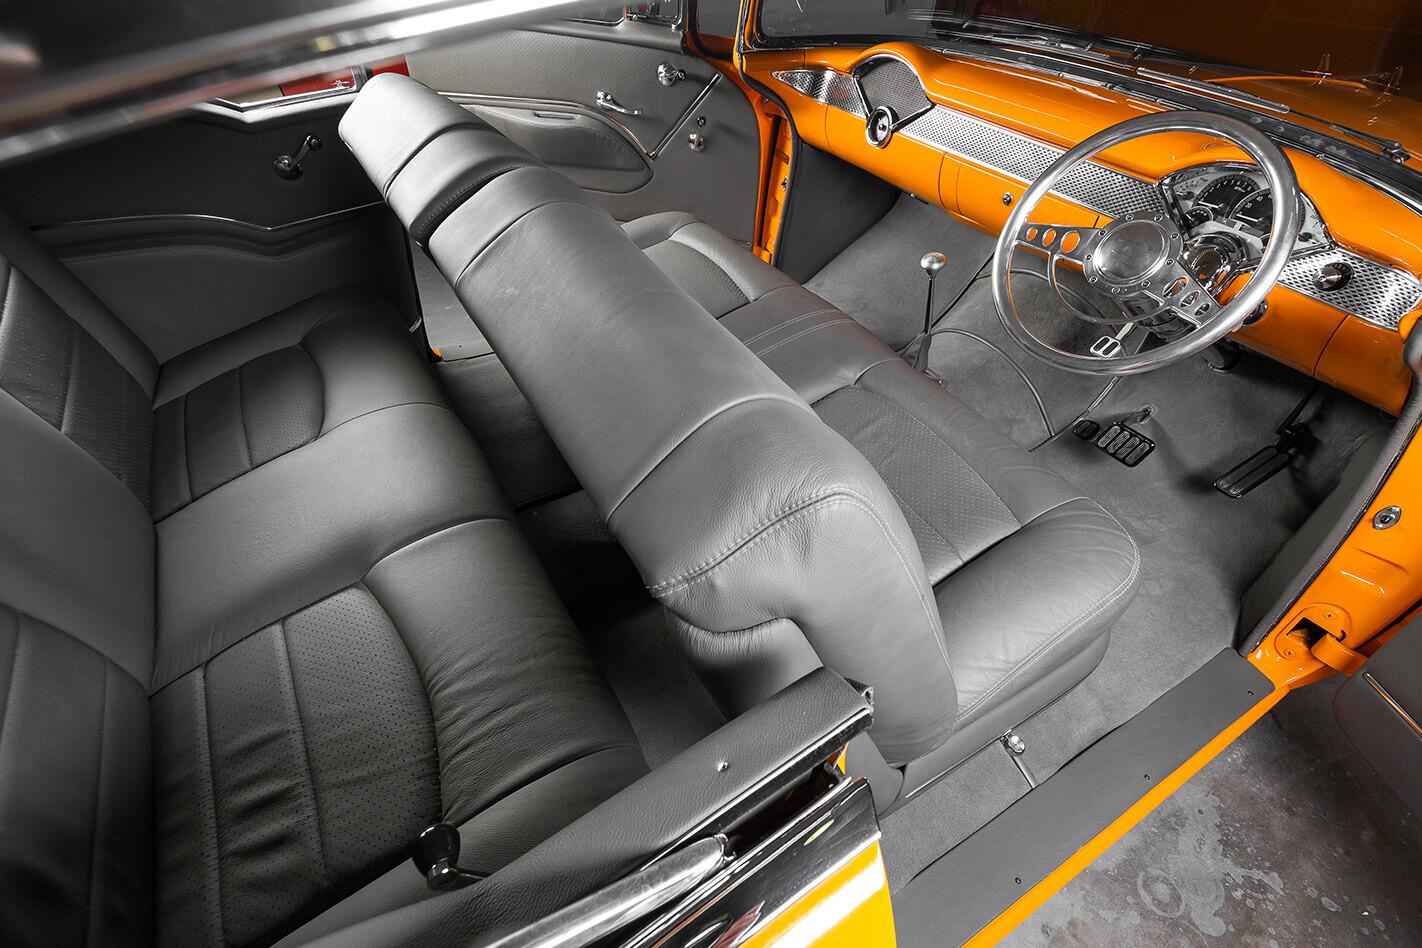 Chev Bel Air interior